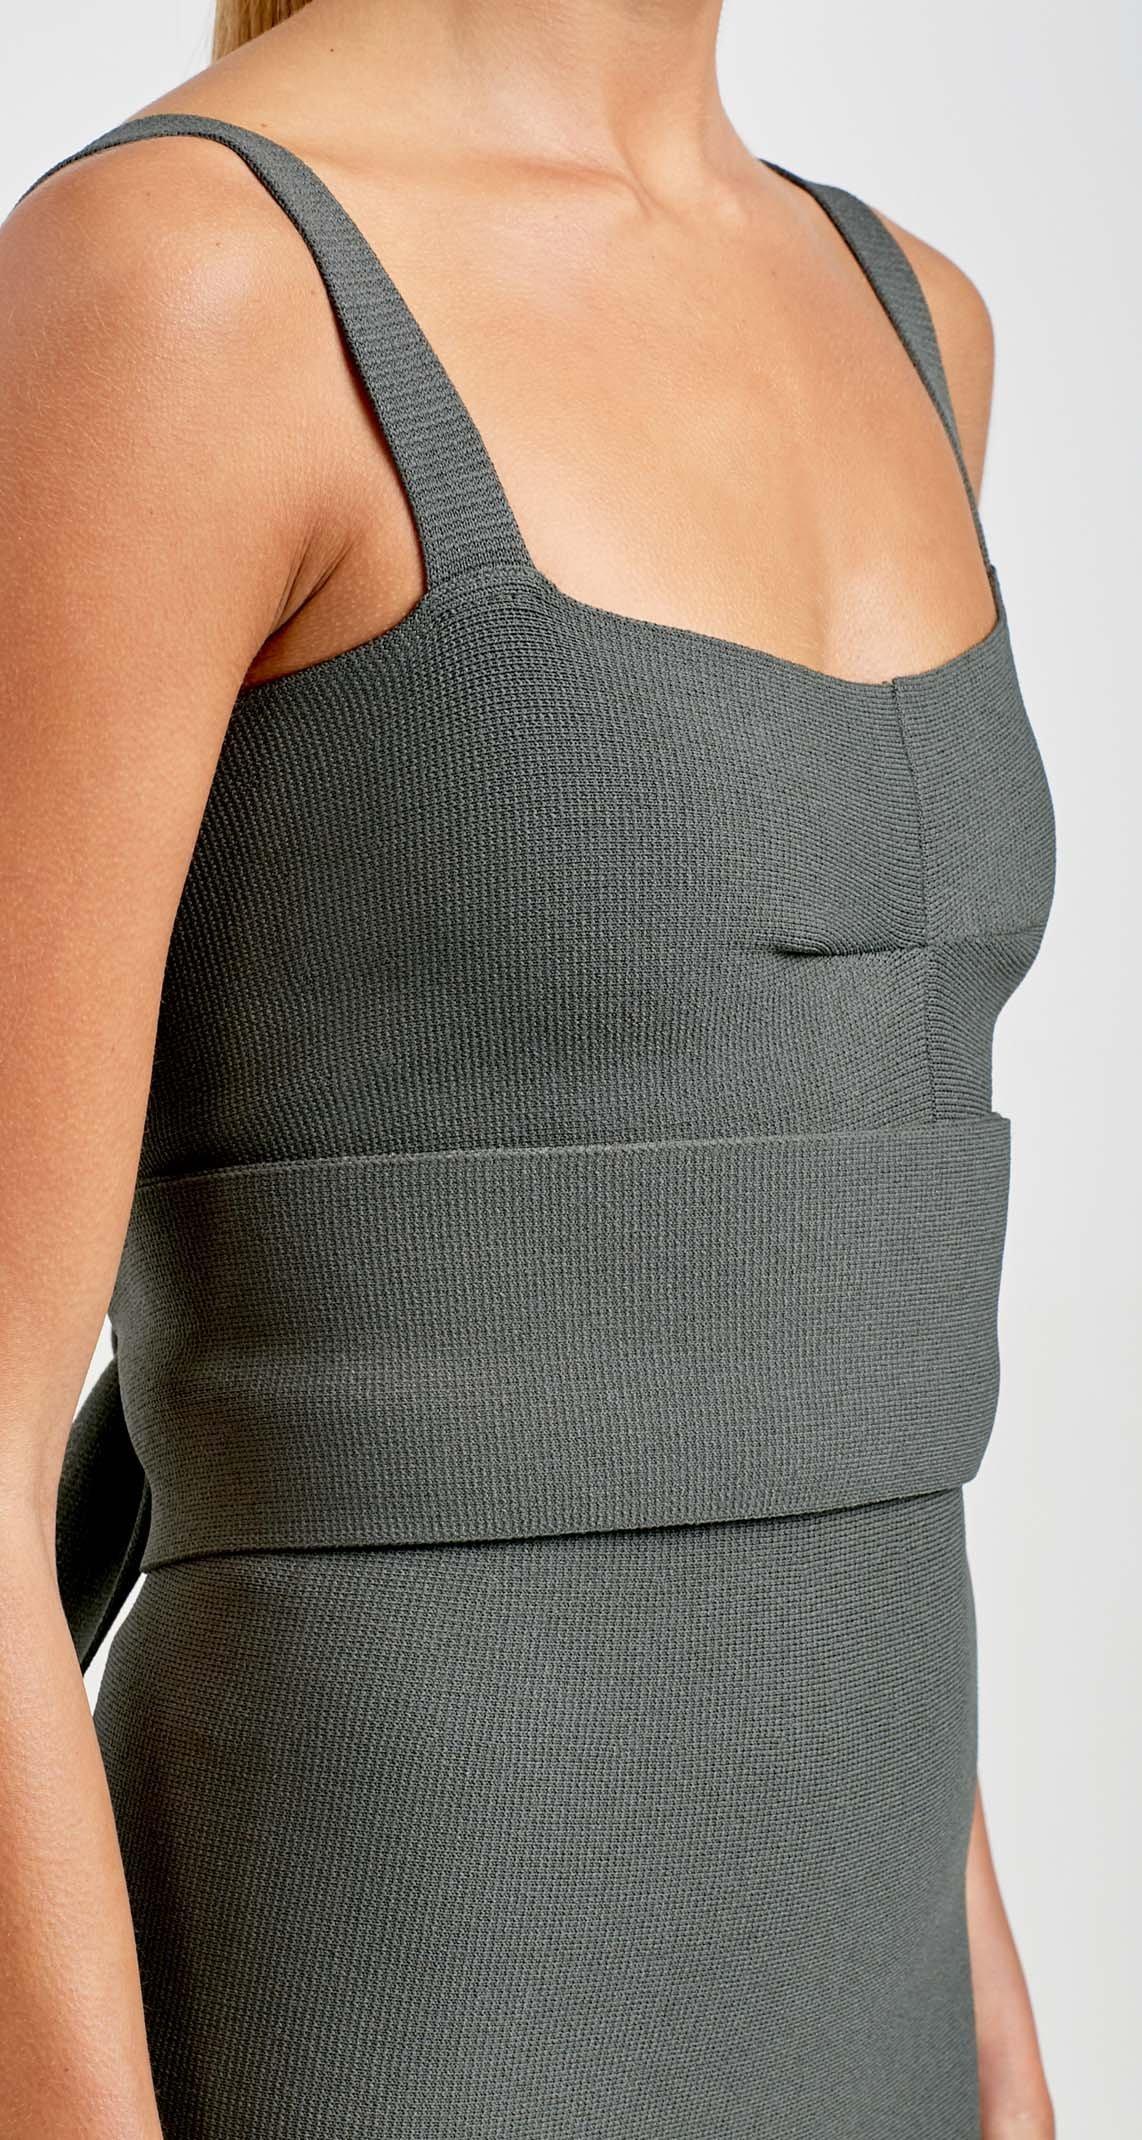 a5e2f72fe0f5a ... Scanlan Theodore - Crepe Knit Bralette Dress Grey Size 6